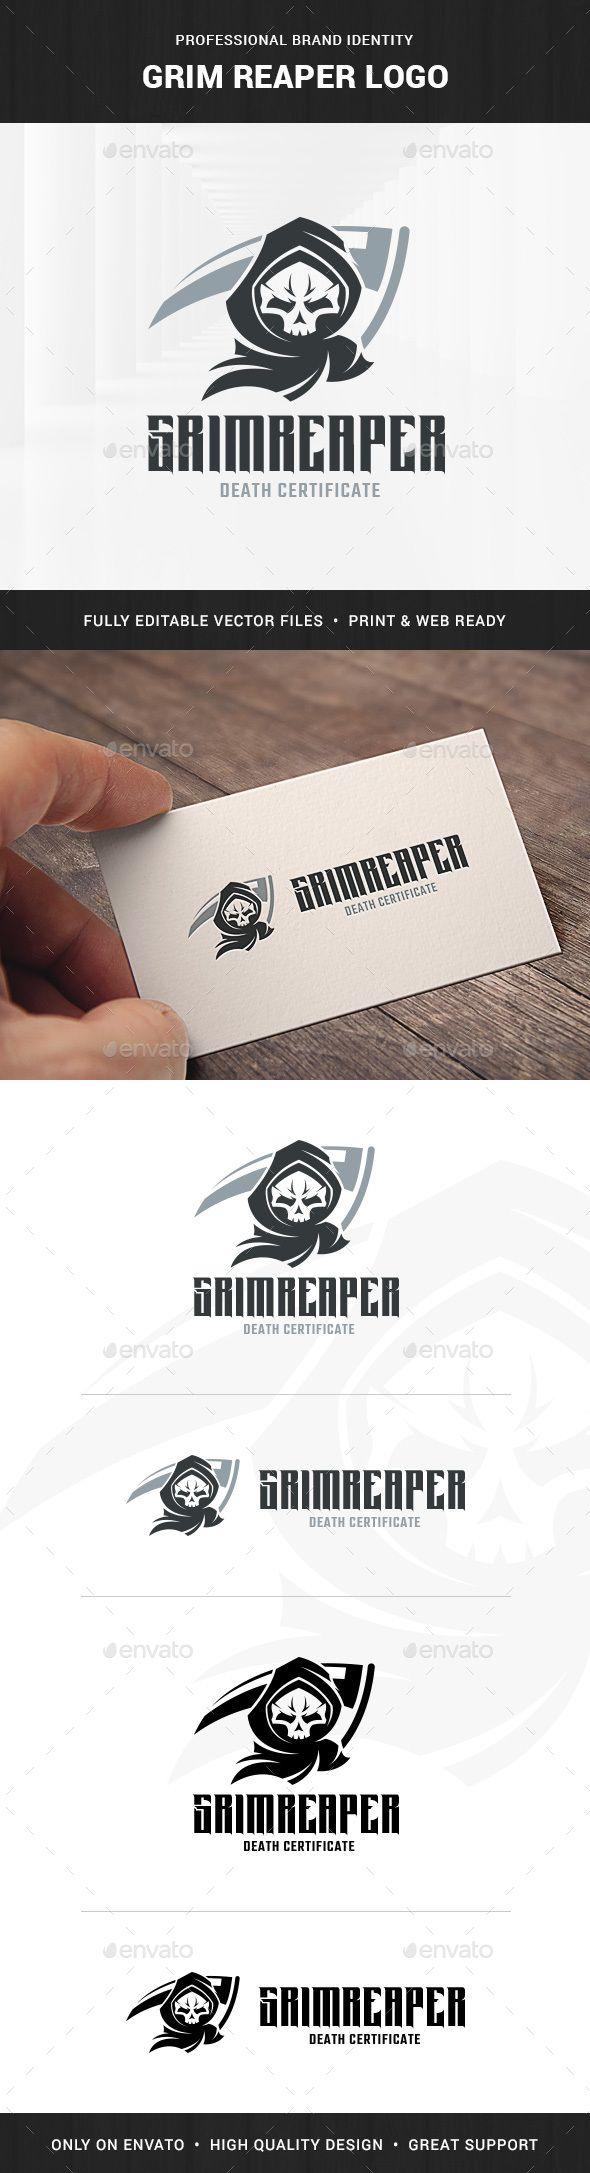 Grim Reaper Logo Template — Transparent PNG #black #evil • Available here → https://graphicriver.net/item/grim-reaper-logo-template/18012476?ref=pxcr